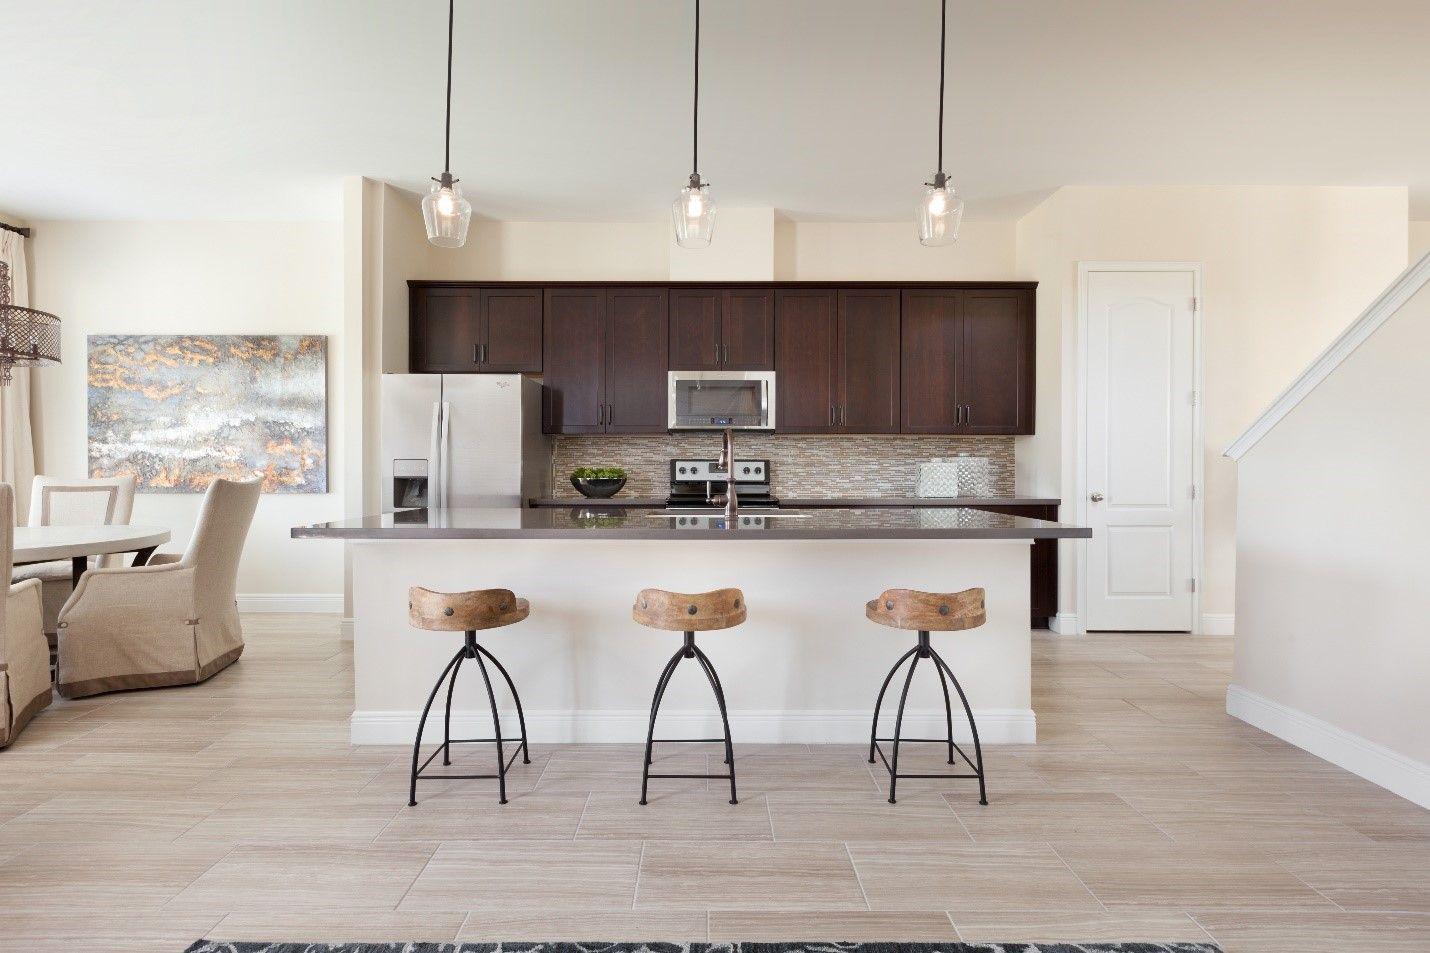 212 Queen Palm Court, Altamonte Springs, FL 32701, Altamonte Springs, FL Homes & Land - Real Estate